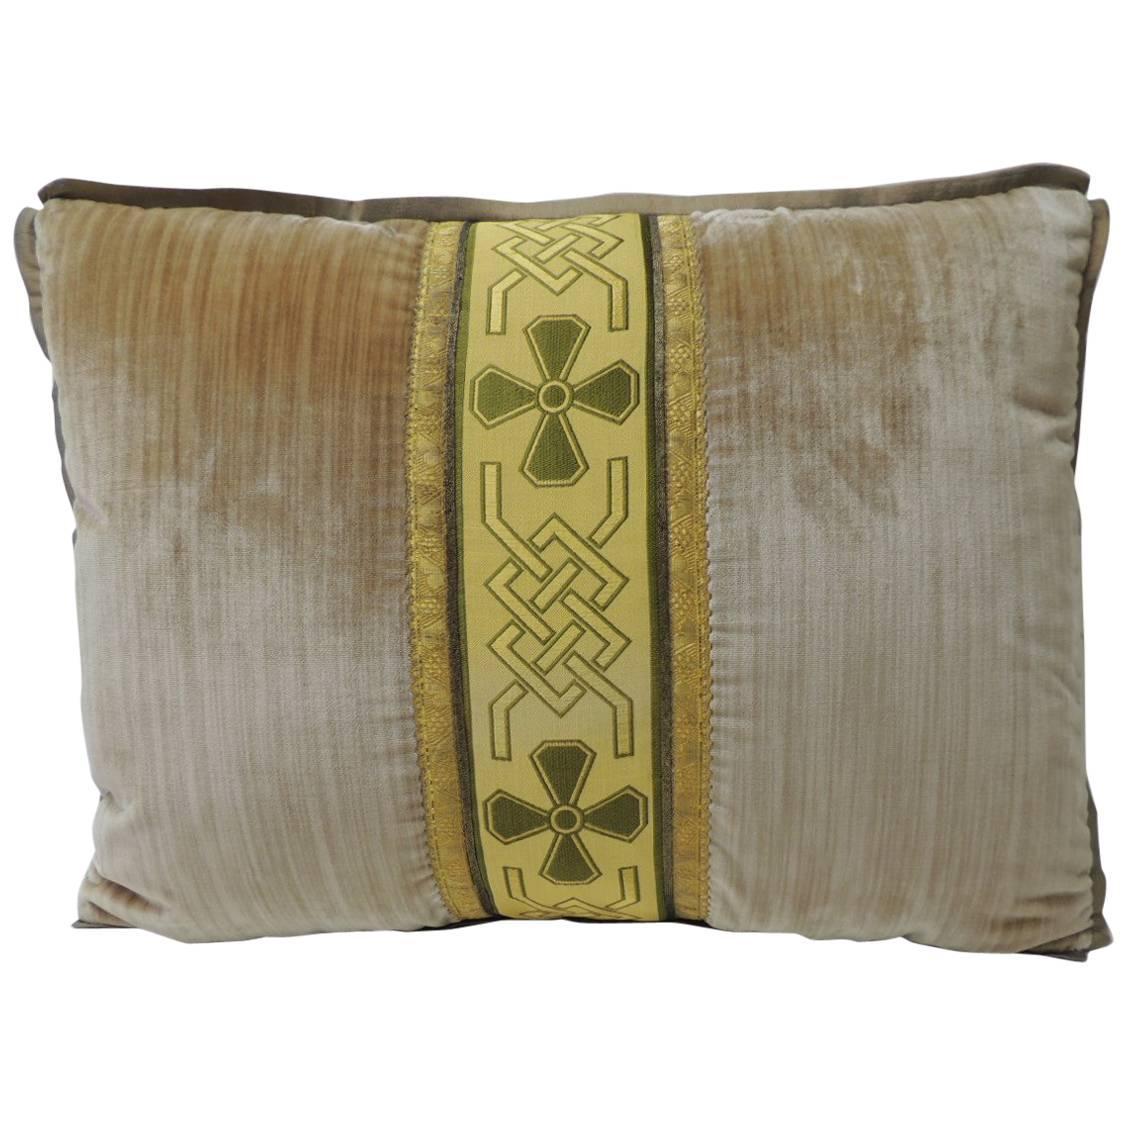 19th Century Silk Golden Velvet with French Silk Woven Ribbon Throw Pillow